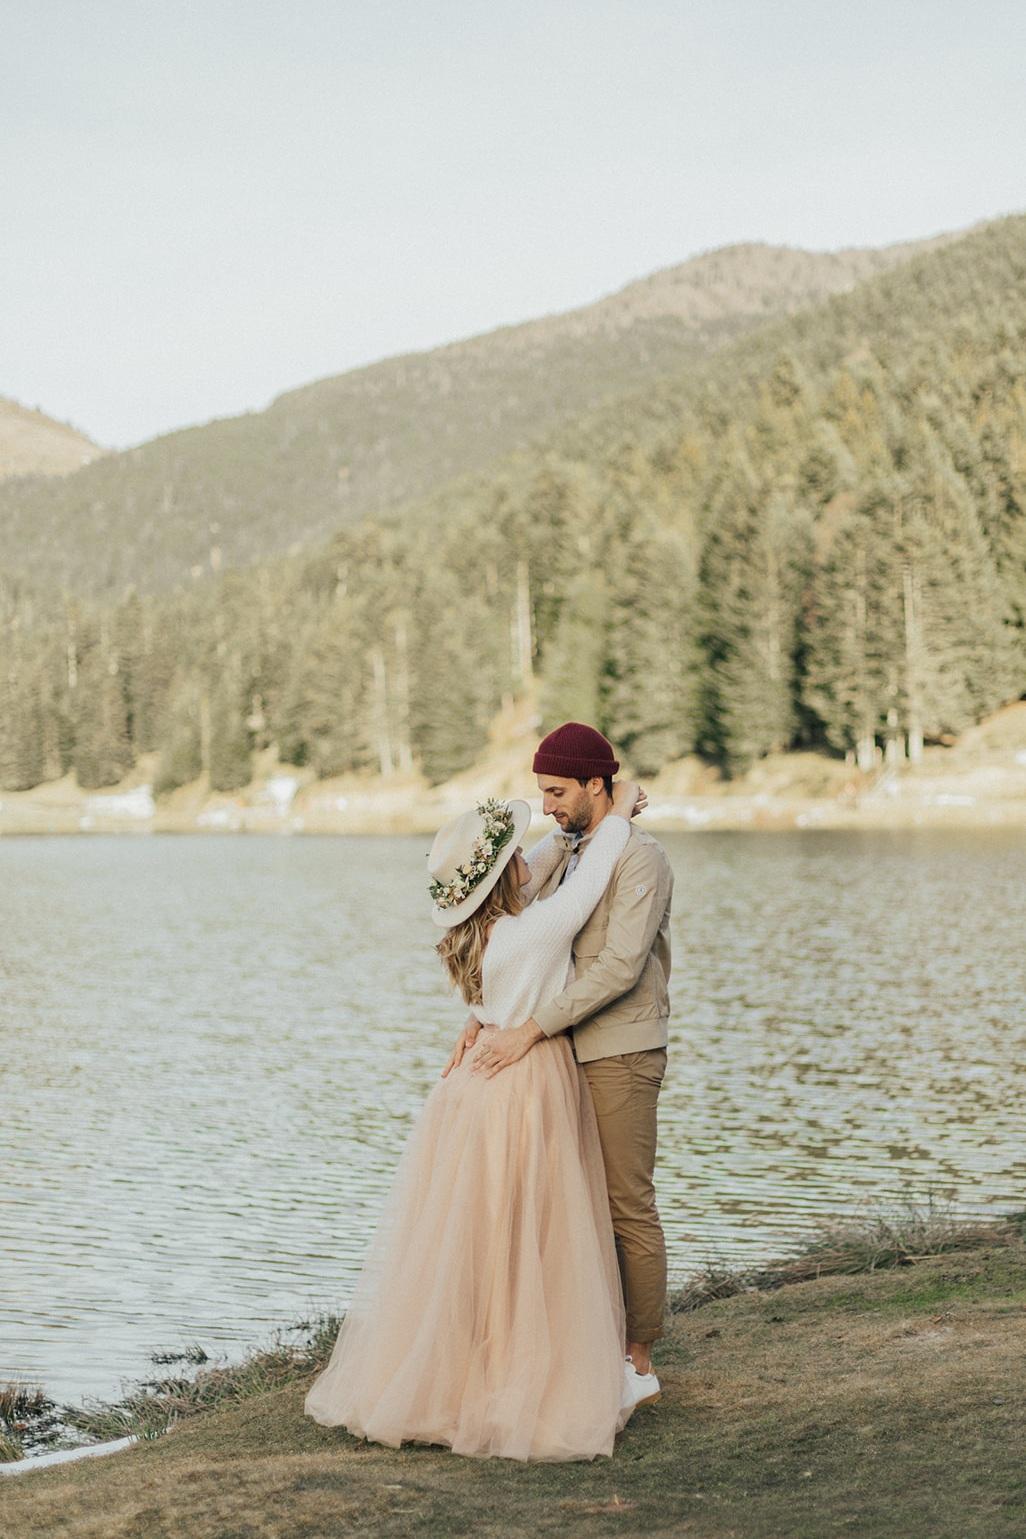 bröllop+elopement+ellen marie bridal